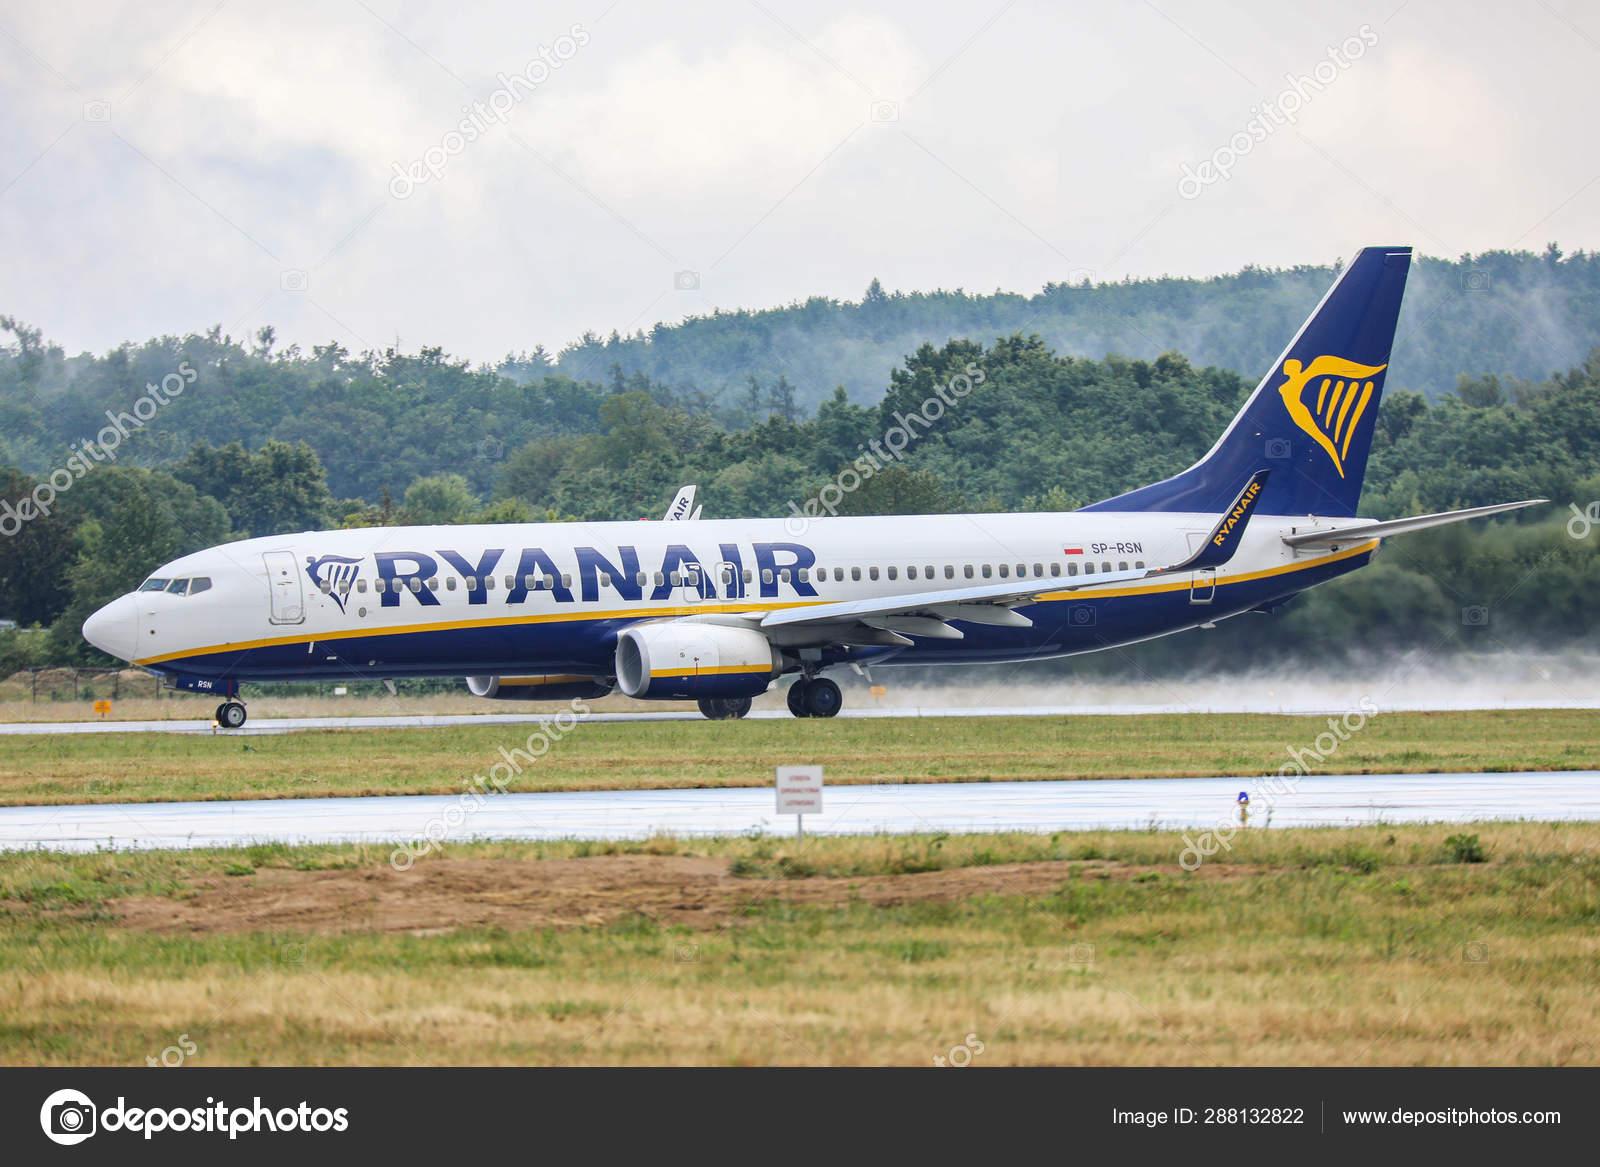 Обои ночь, Boeing 737, Самолёт, b737, tuifly, aircraft. Авиация foto 16